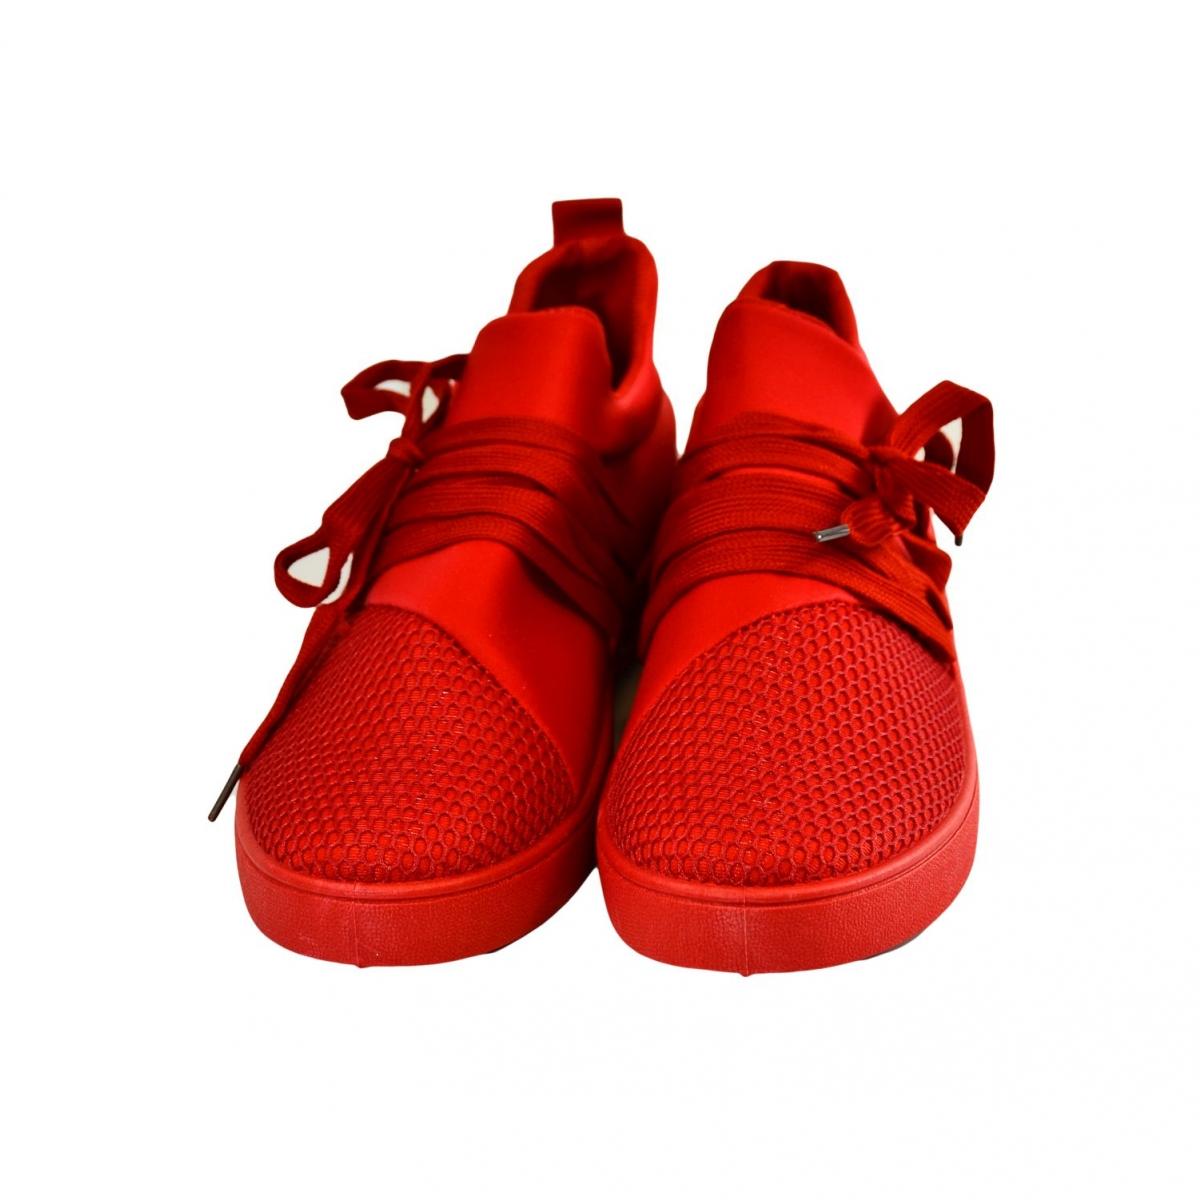 Dámske červené tenisky NABIN - 3 2da289ae5f8